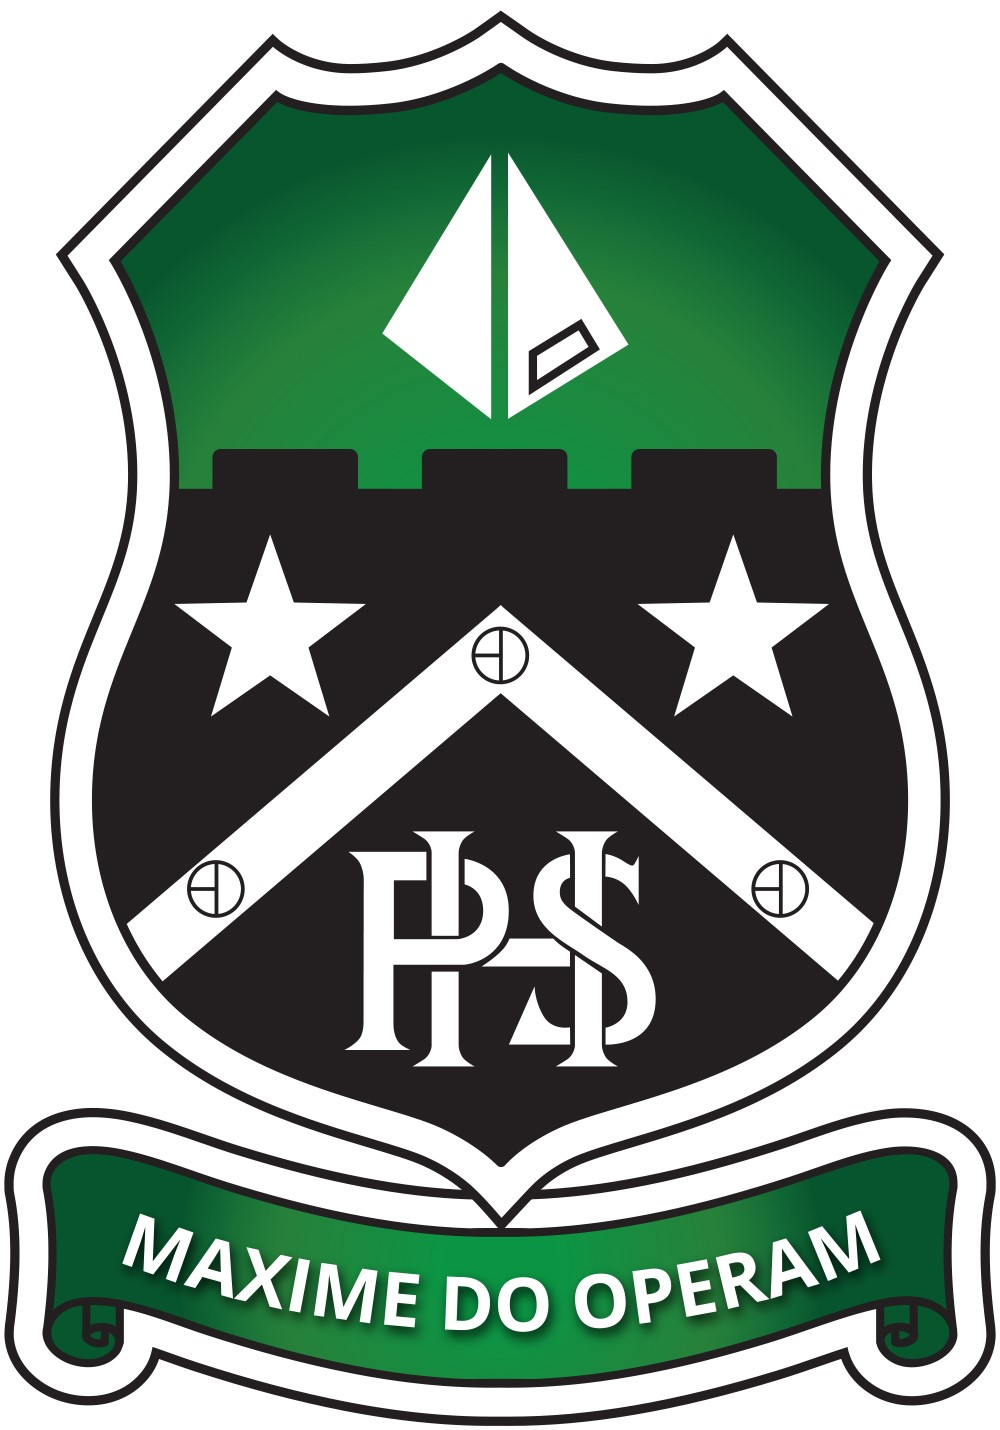 Pearson U19